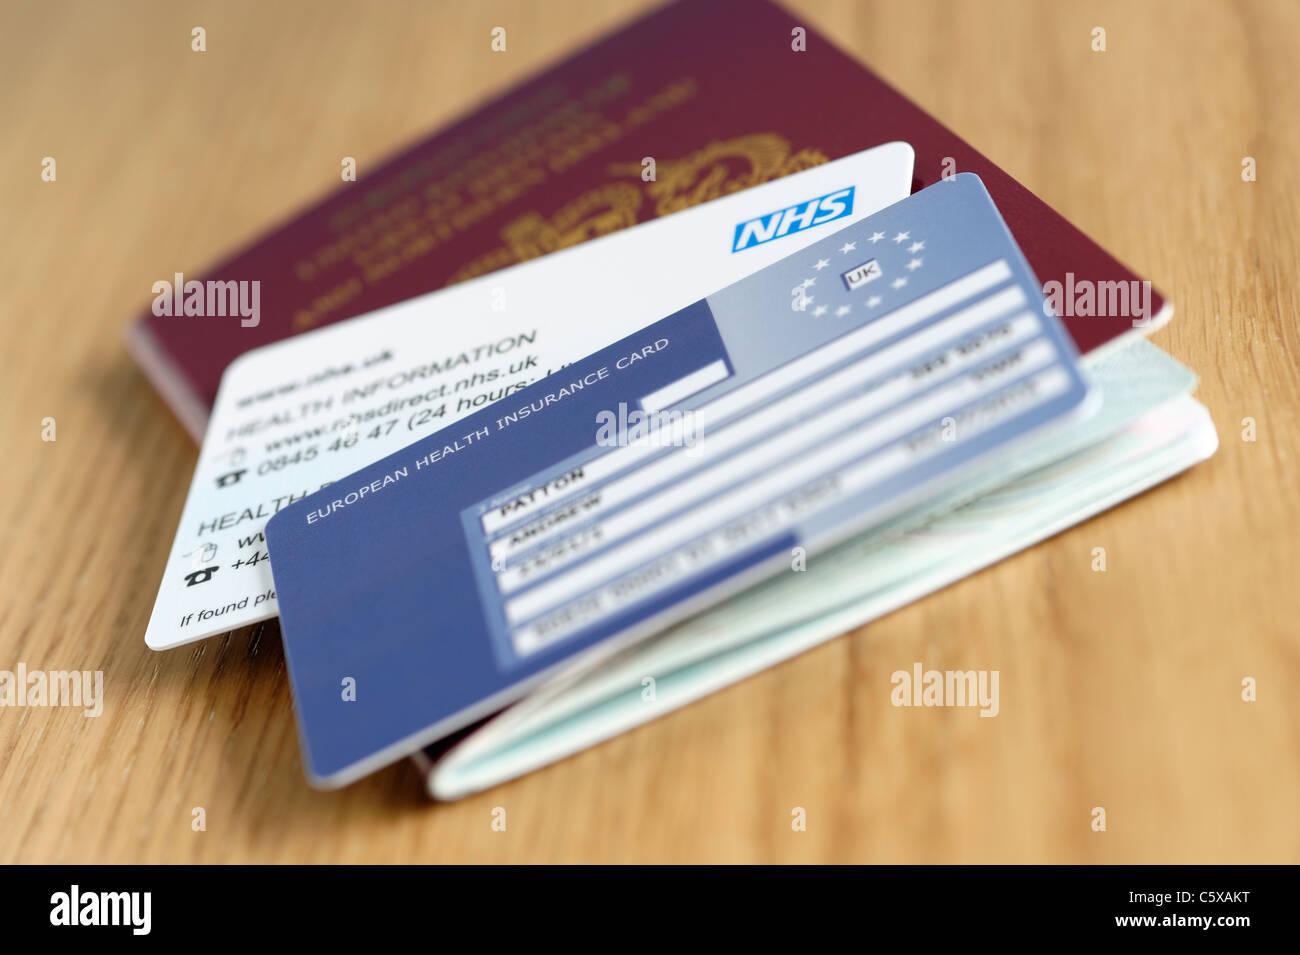 UK NHS EHIC card and passport - Stock Image